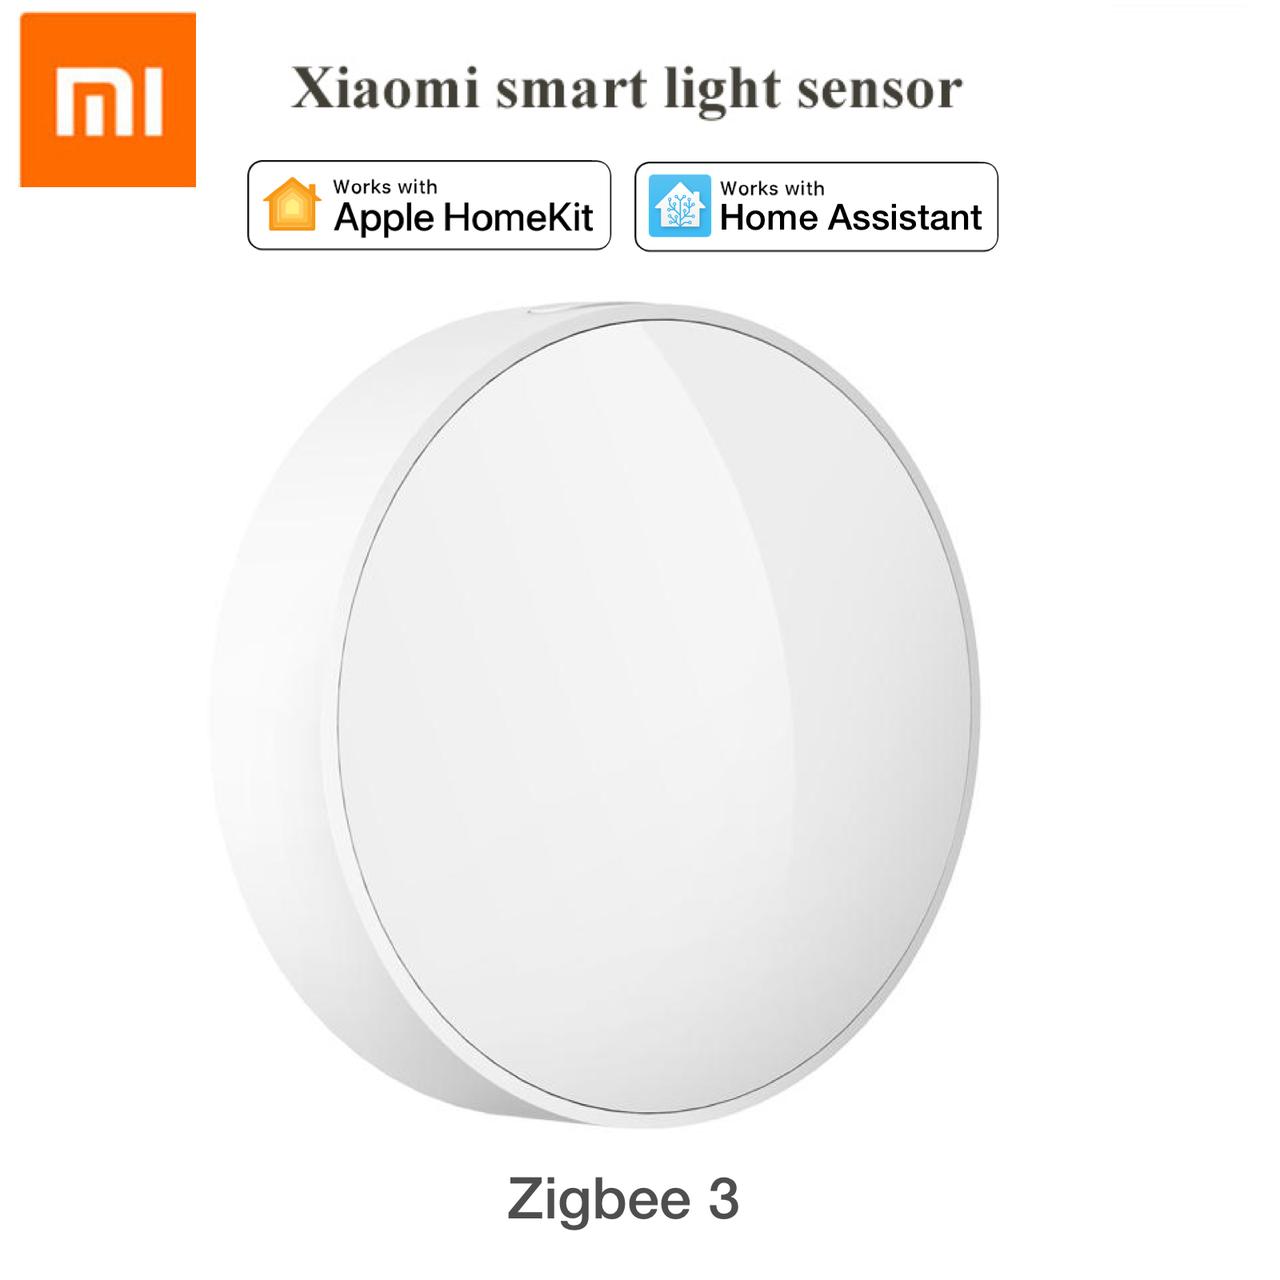 Датчик освітленості Xiaomi Mijia Smart Light Sensor водостойкий GZCGQ01LM Zigbee HomeKit (Датчик освещенности)